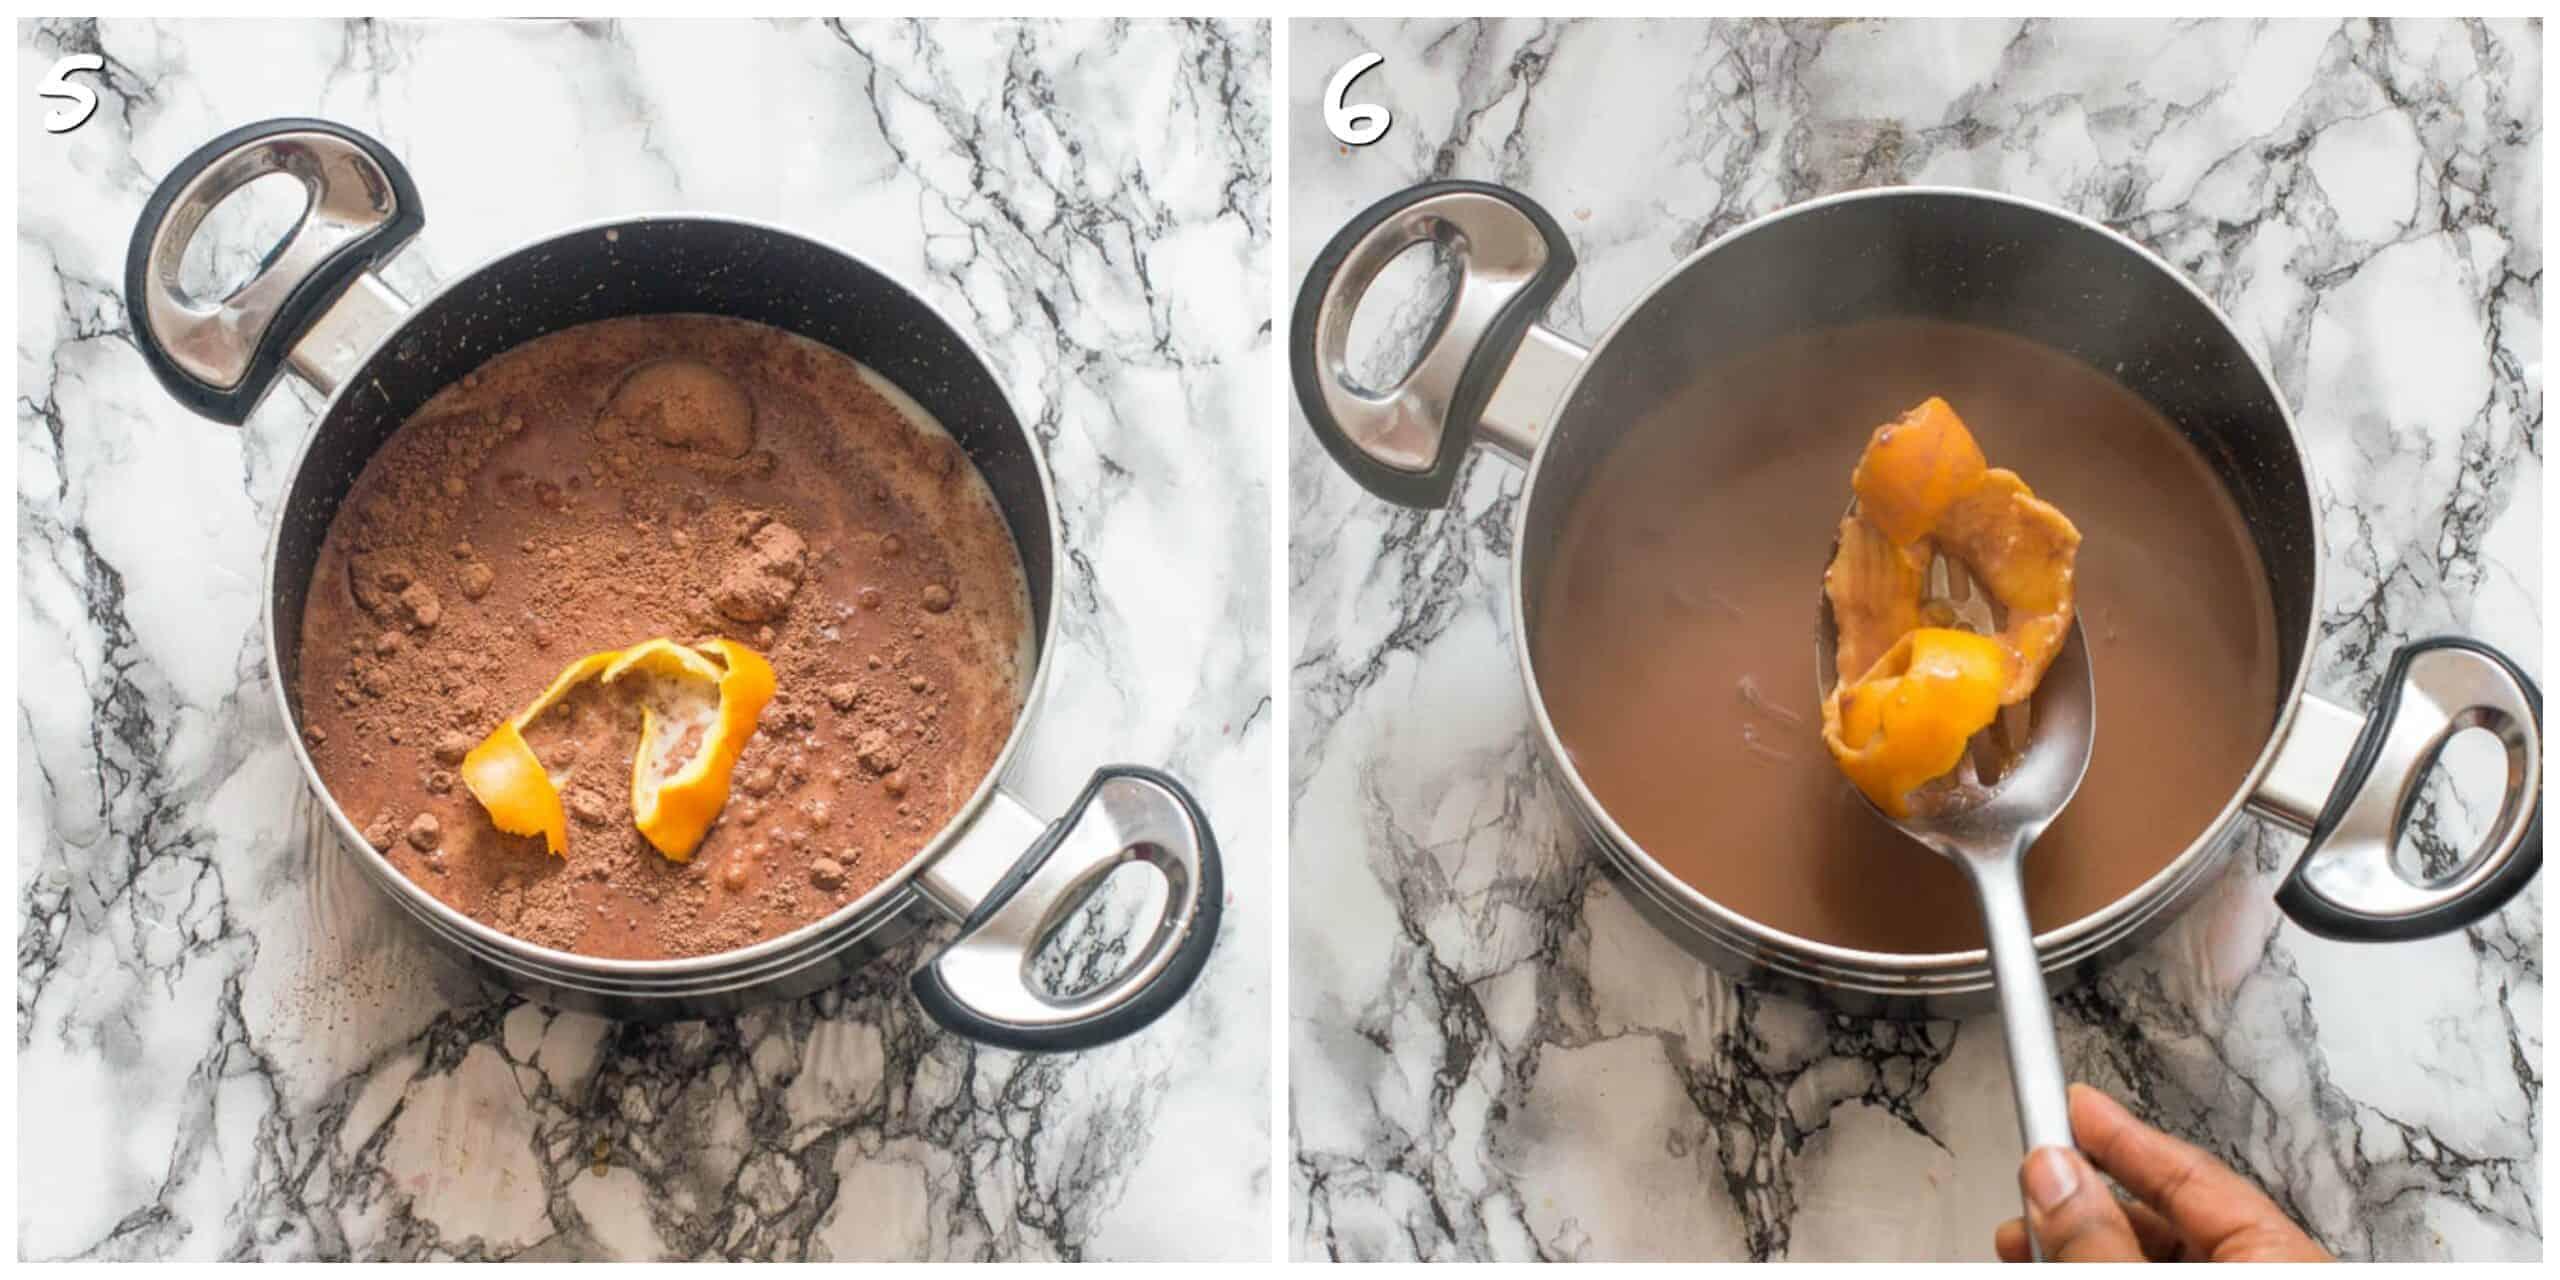 steps 5-6 adding and removing orange peel